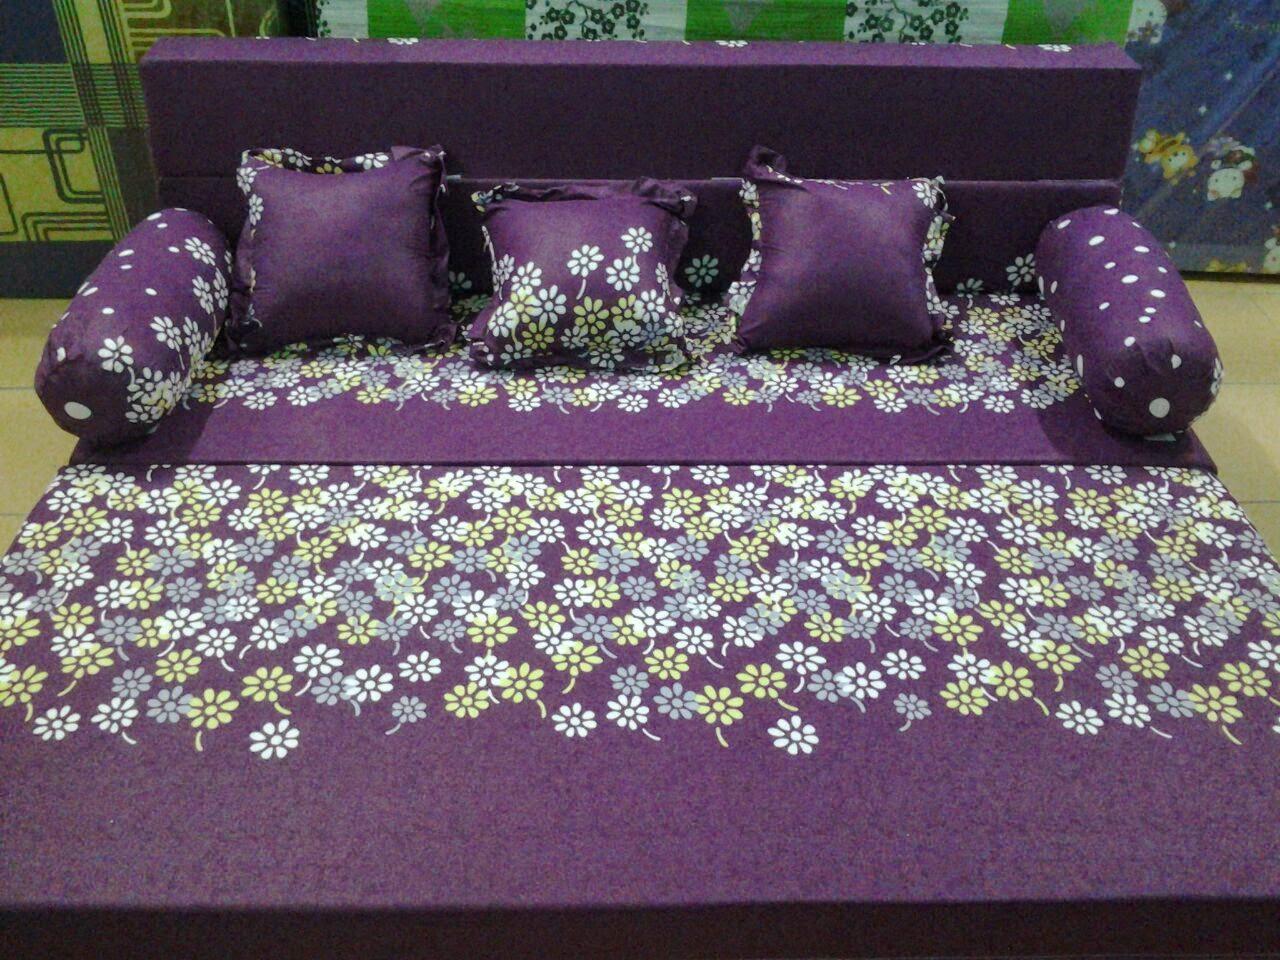 Harga Cover Sofa Bed Inoac Sure Fit Stretch Pinstripe 2 Pc Slipcover Popi Ungu Nikita Aneka Produk Foam